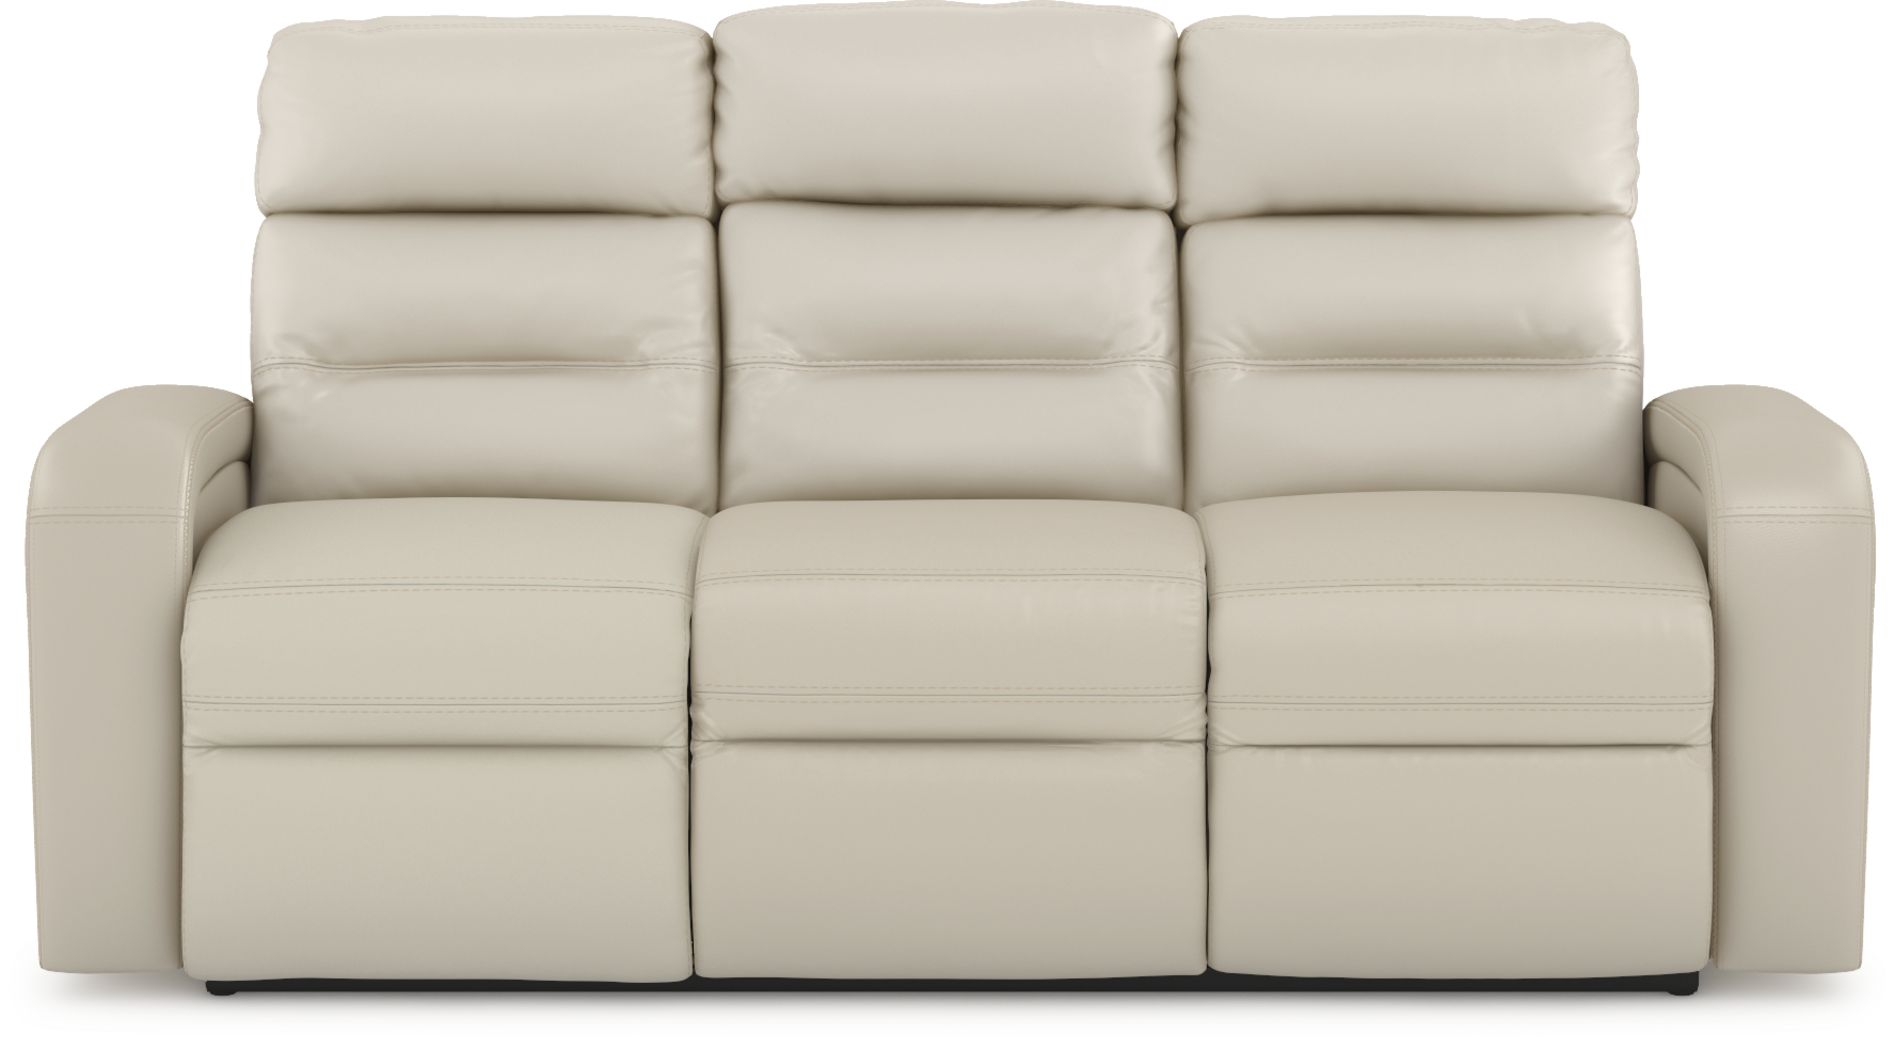 Sierra Madre Beige Leather Dual Power Reclining Sofa